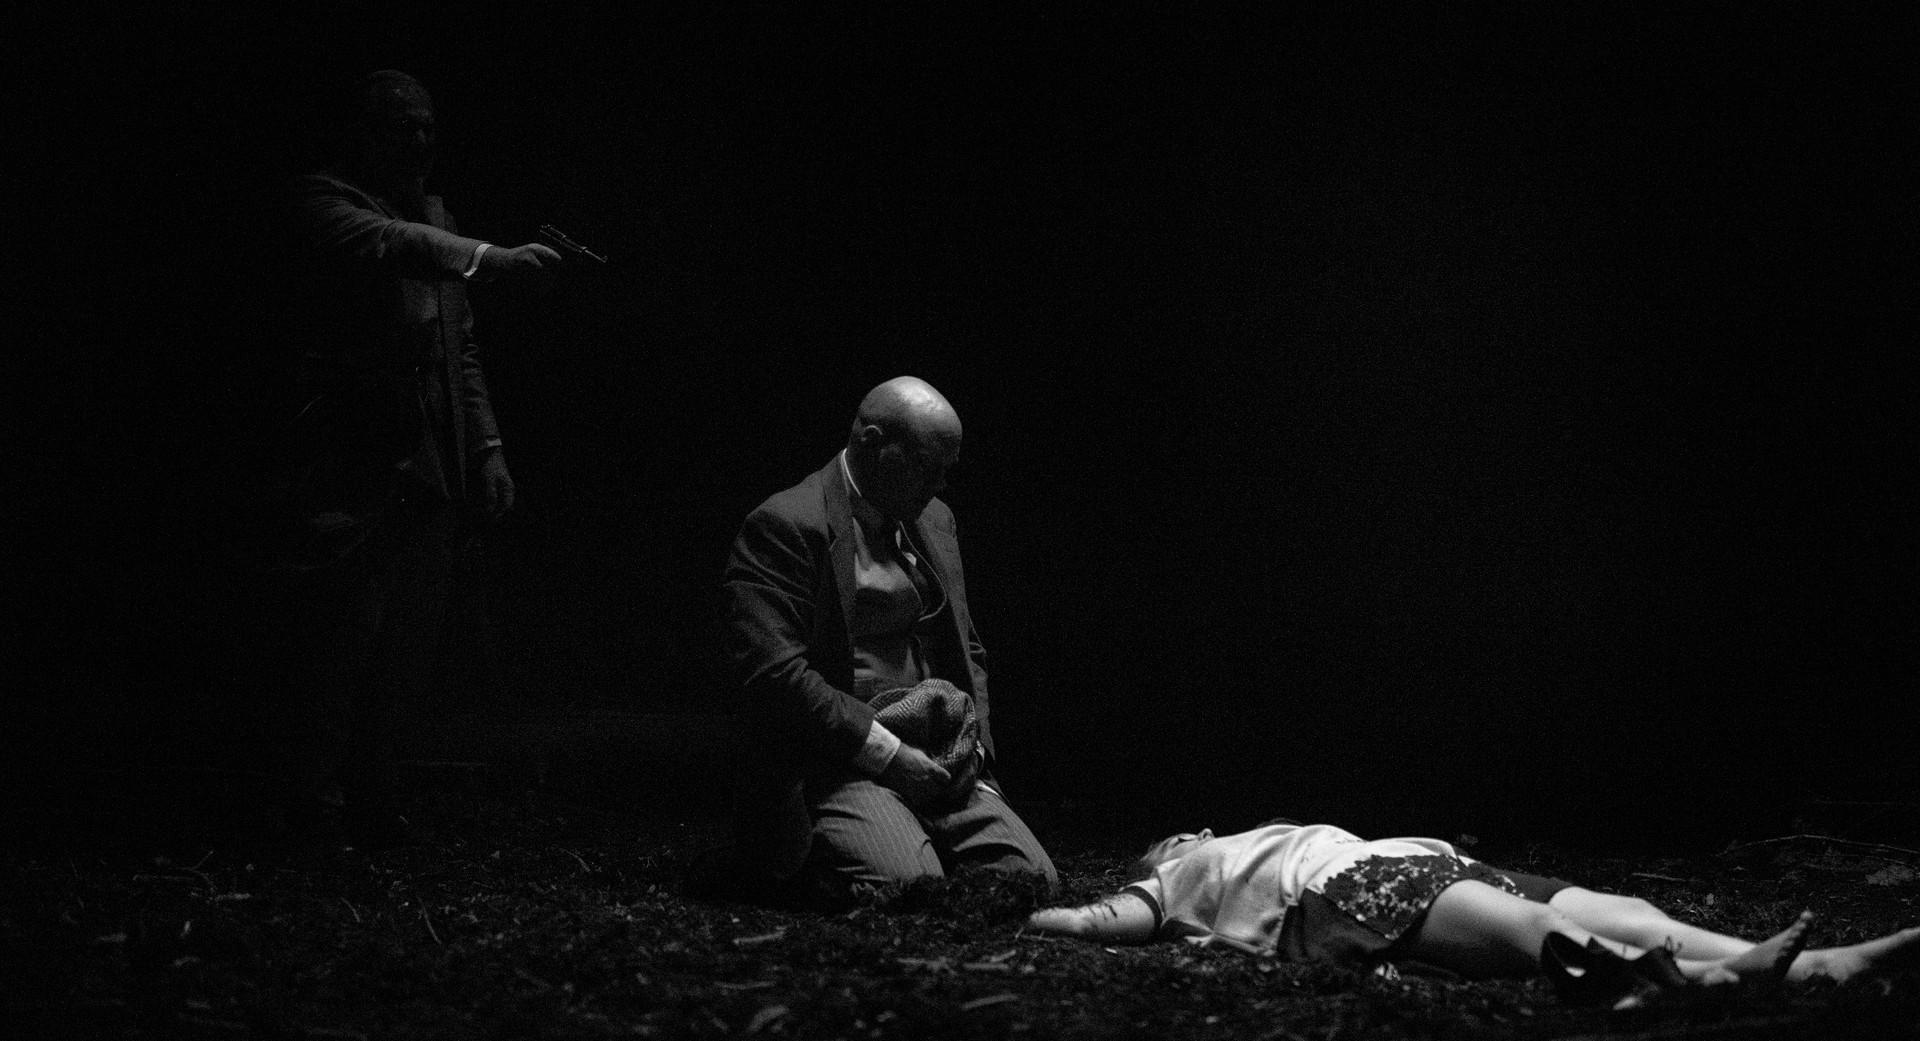 Noir / Crédit photo: Fabrice Gaetan